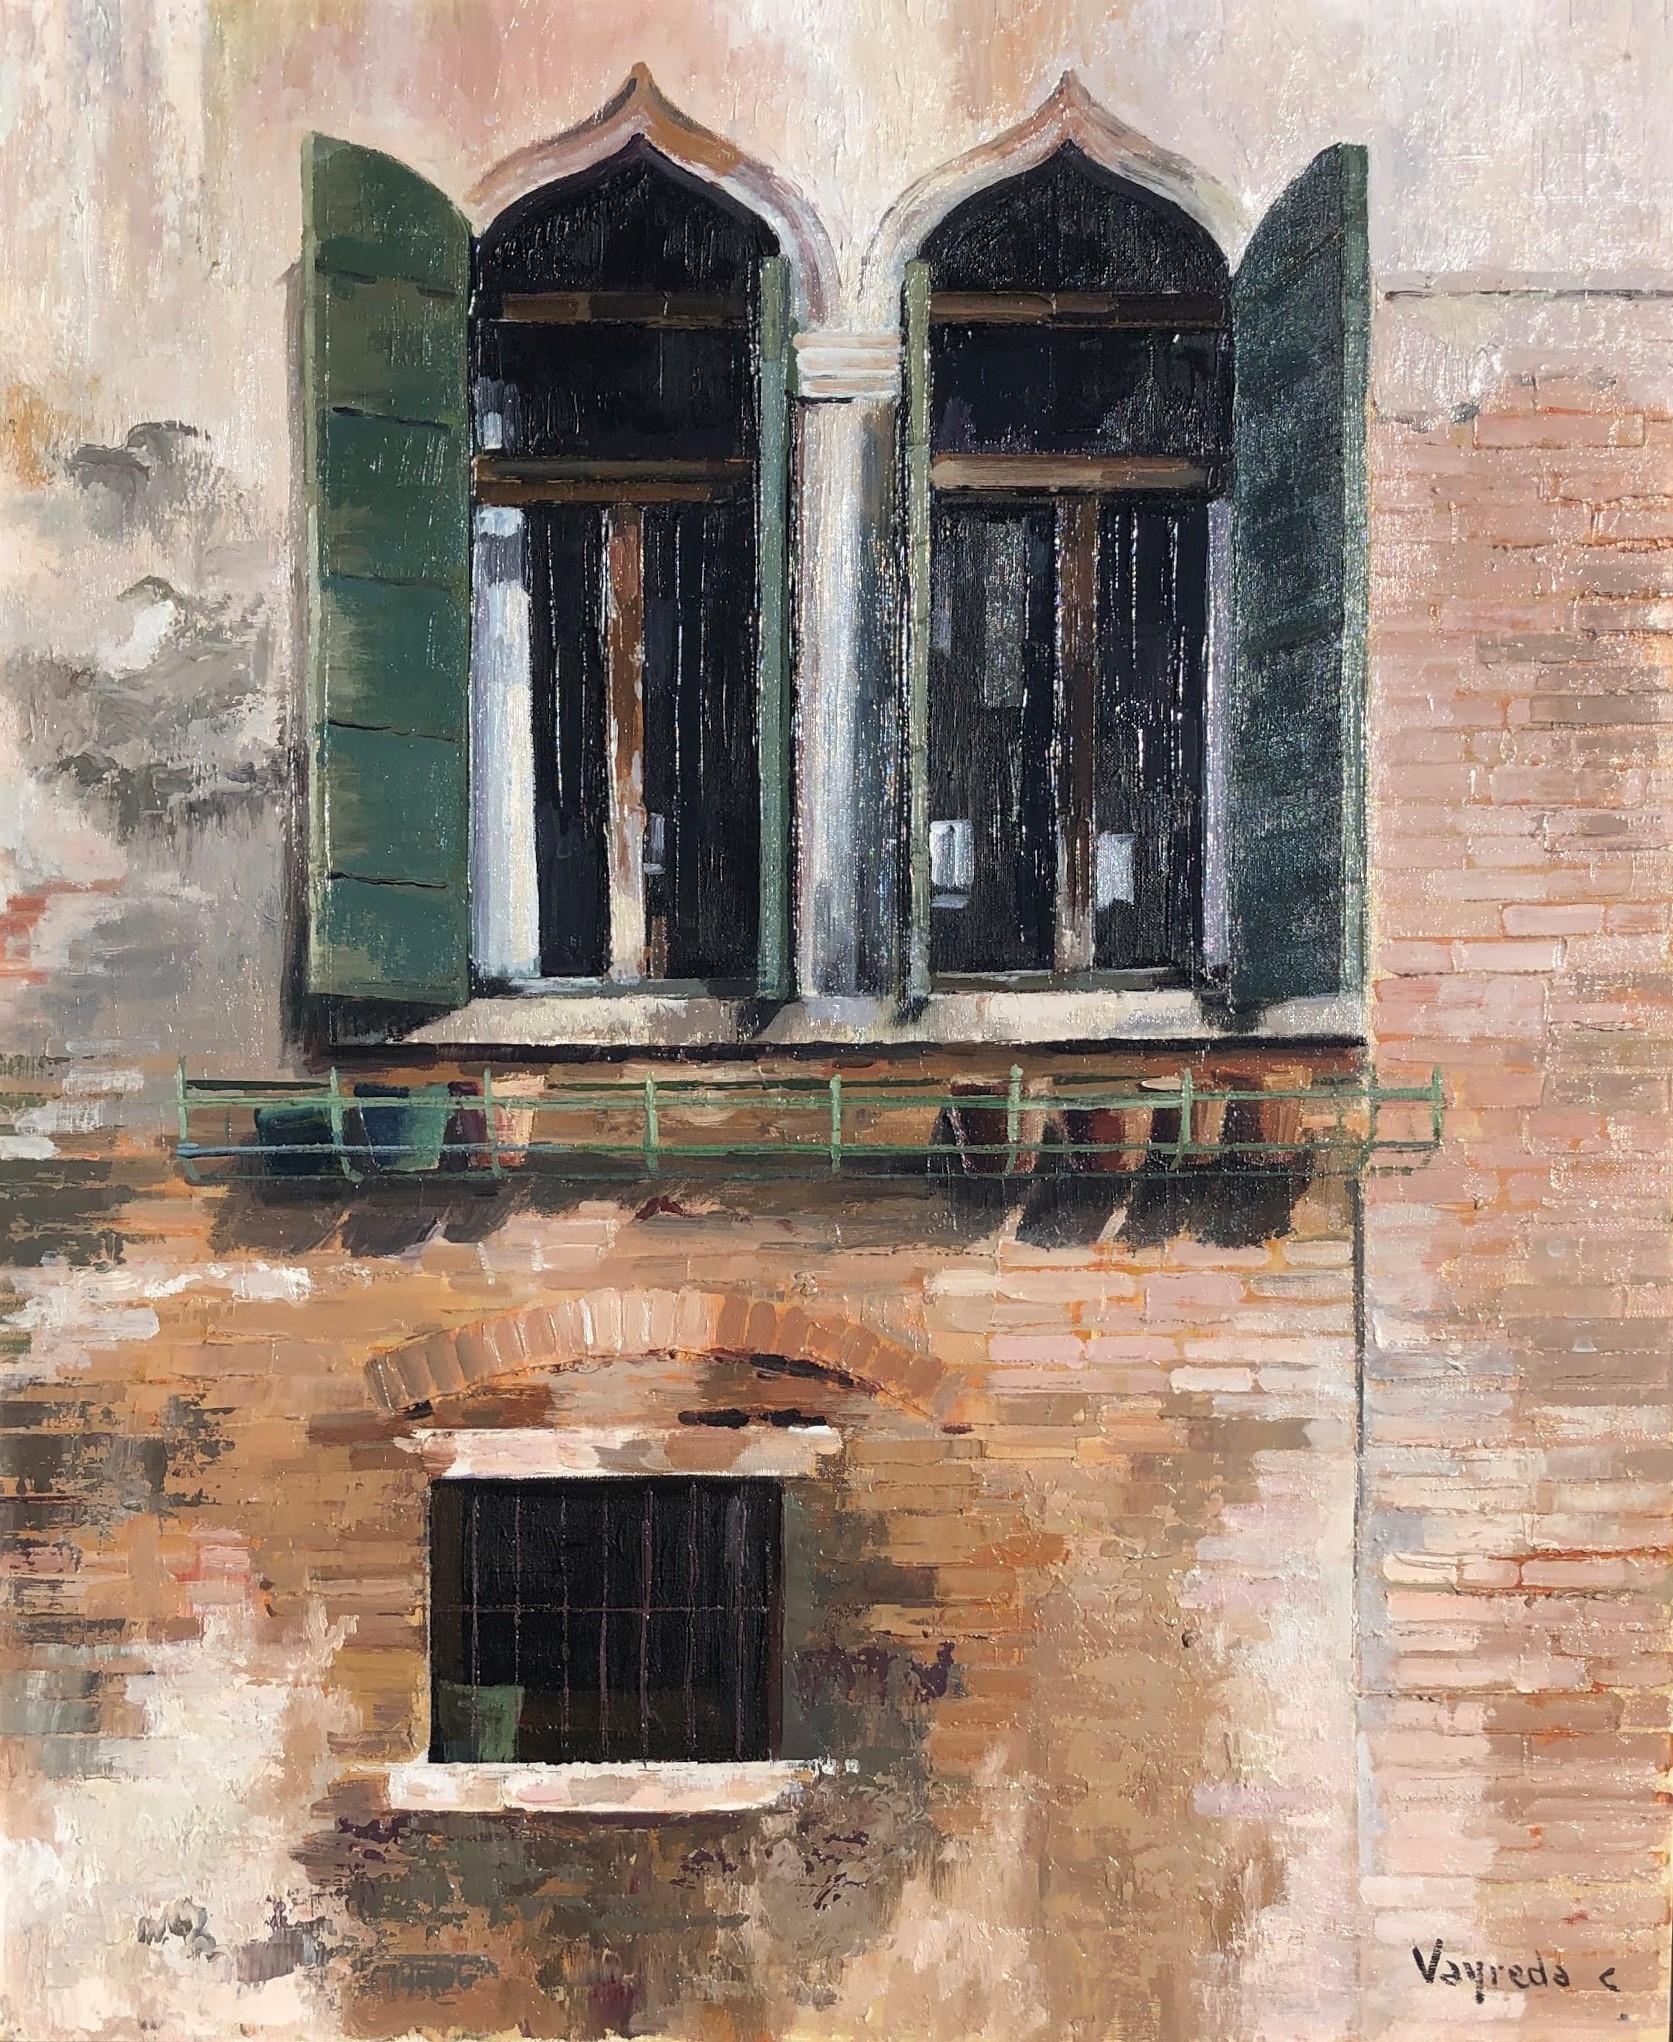 Venice window original oil on canvas painting